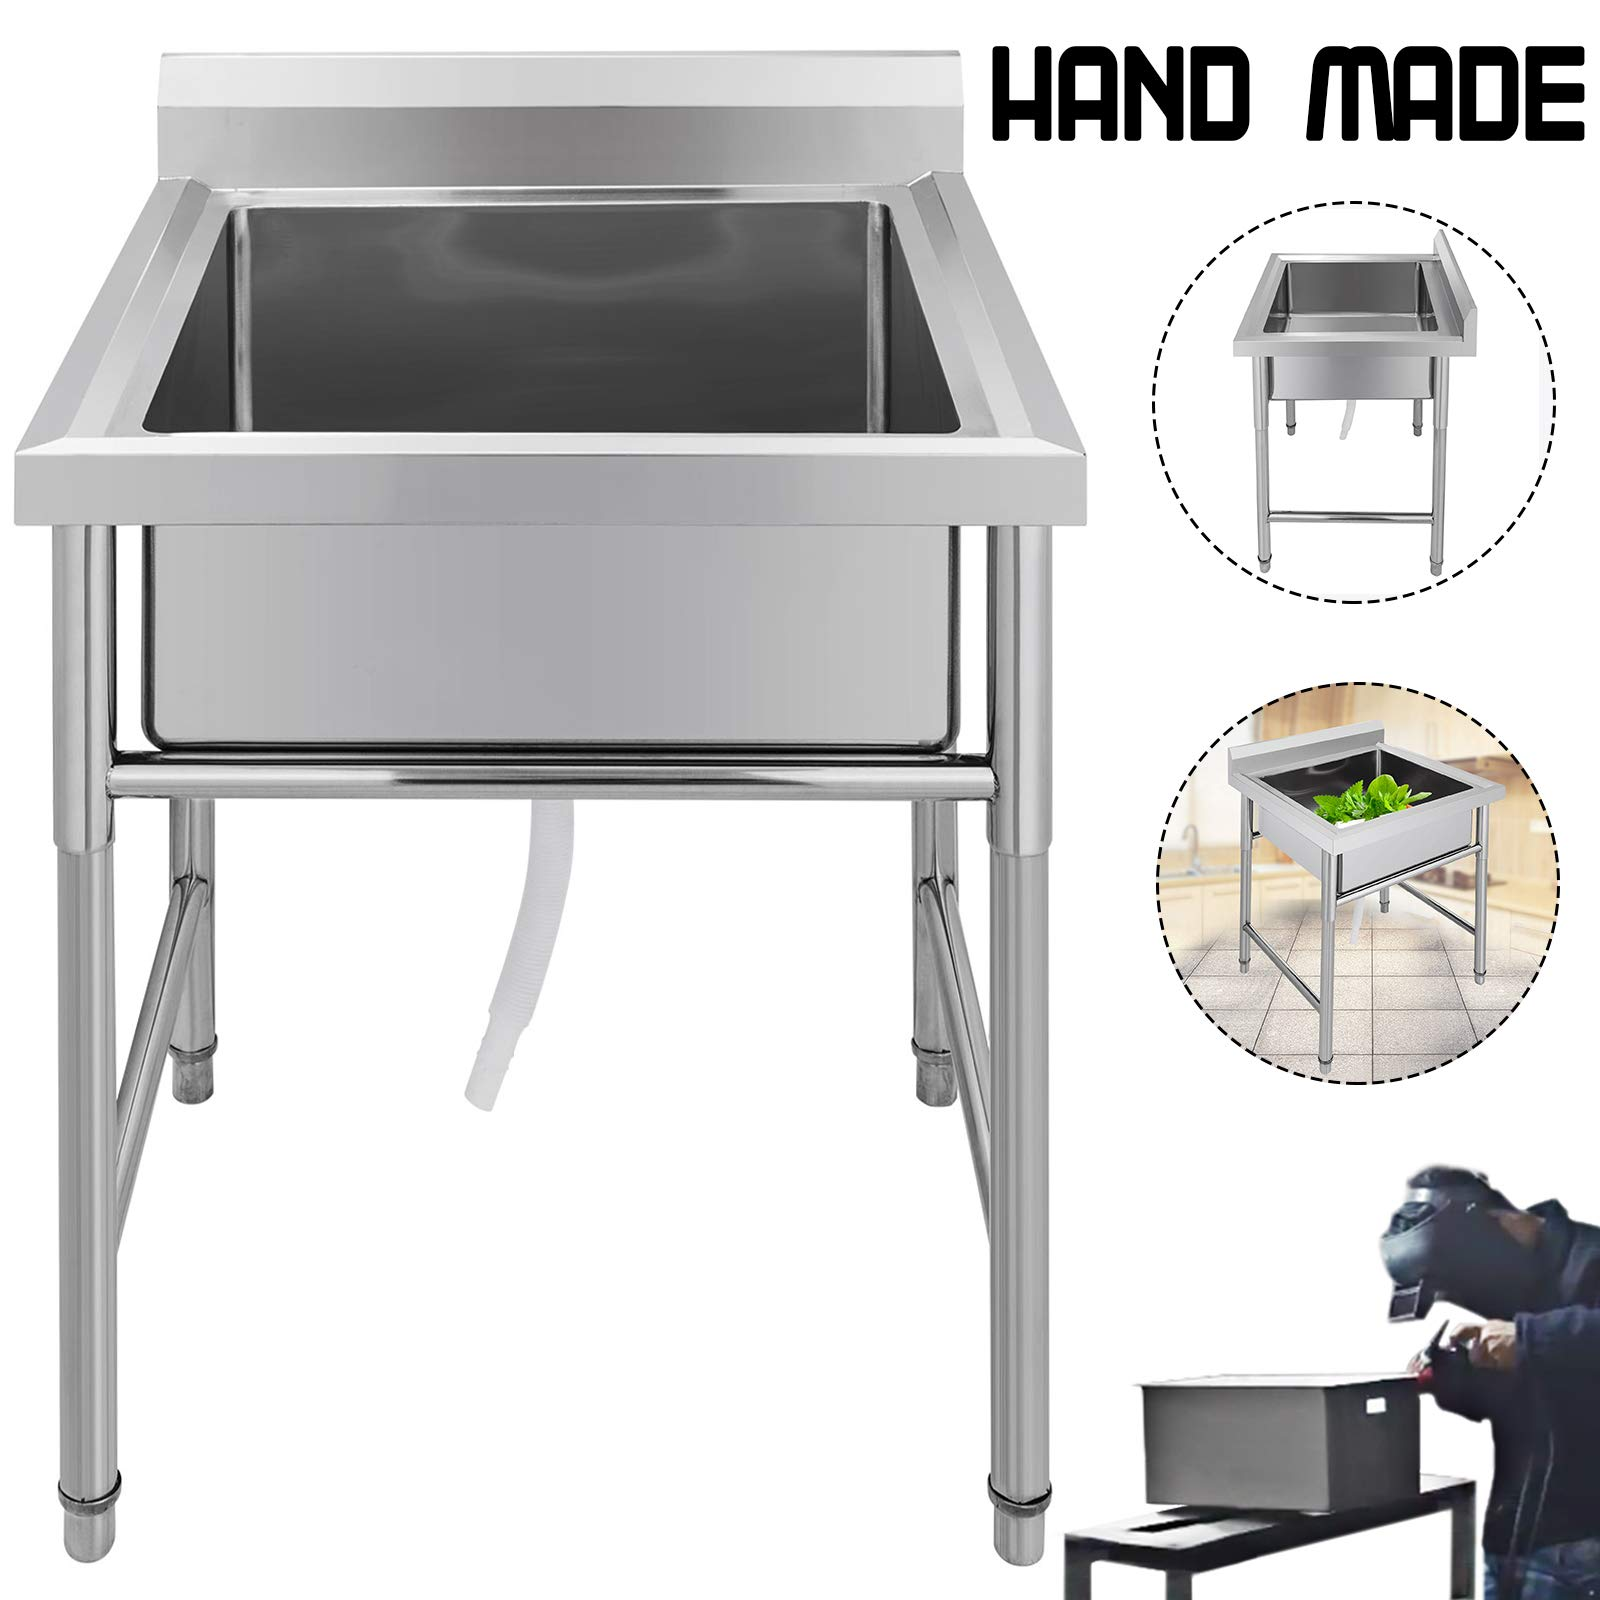 "Mophorn 1 Compartment Stainless Steel Bar Sink 23.5""x 22.5""Bowl Size Handmade Underbar Sink for bar, kitchen restaurant"